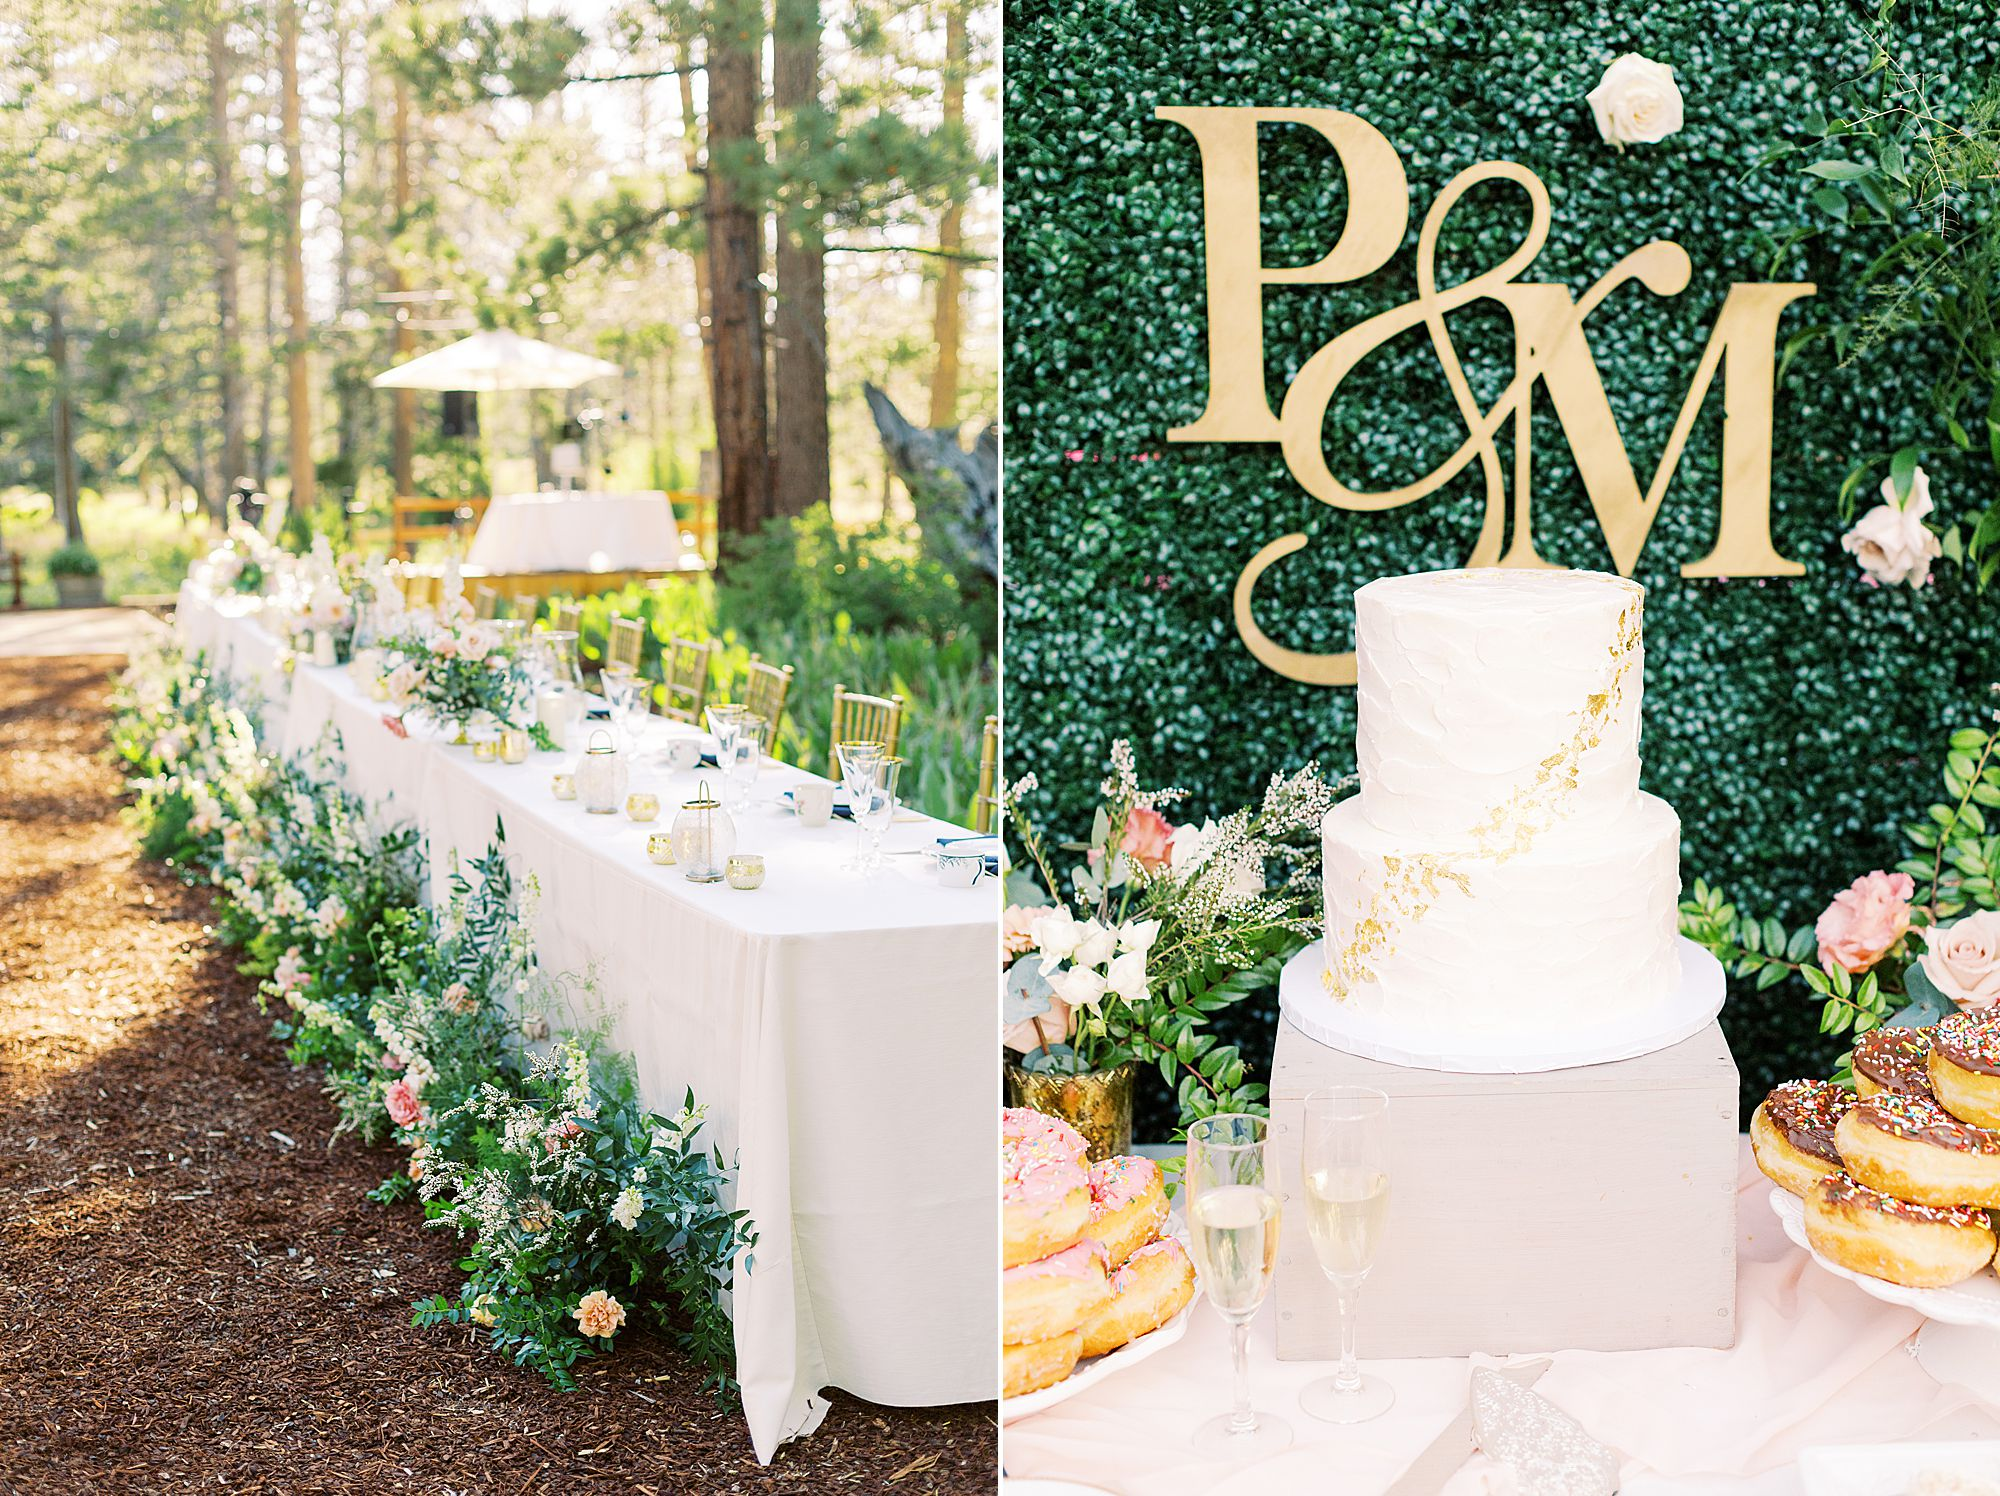 MITCHELLS MOUNTAIN MEADOWS Wedding - Ash Baumgartner - Phallina and Matt - Sierraville Wedding - Tahoe Wedding Photography_0026.jpg